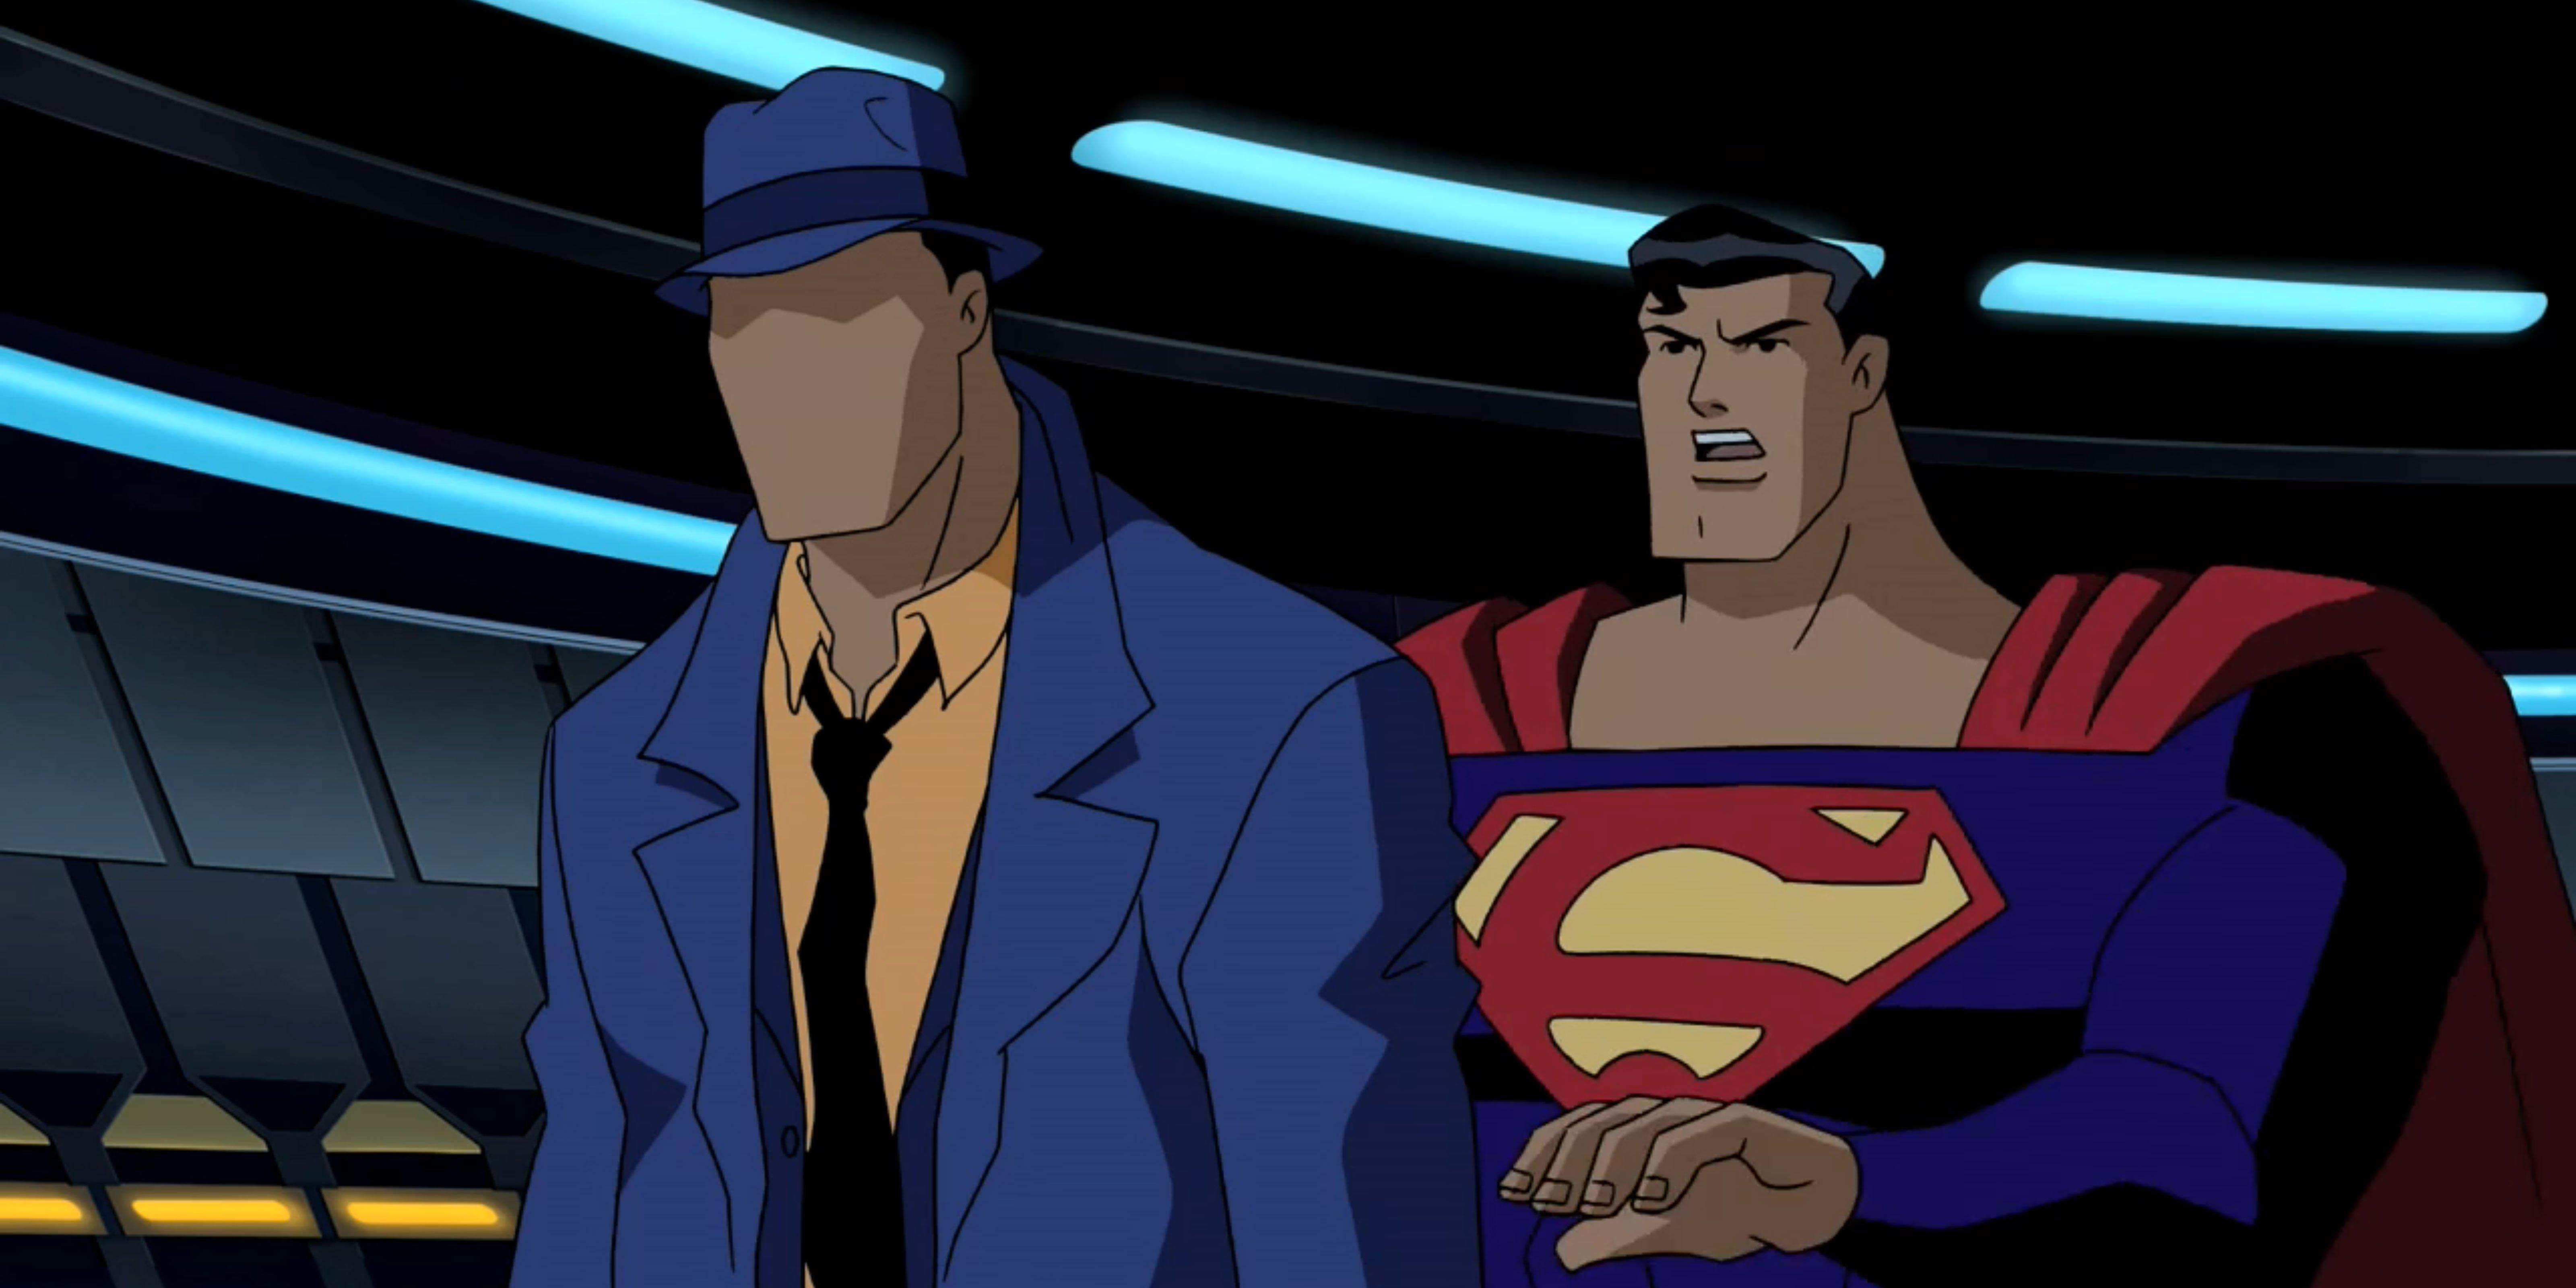 Superman confronts The Question.